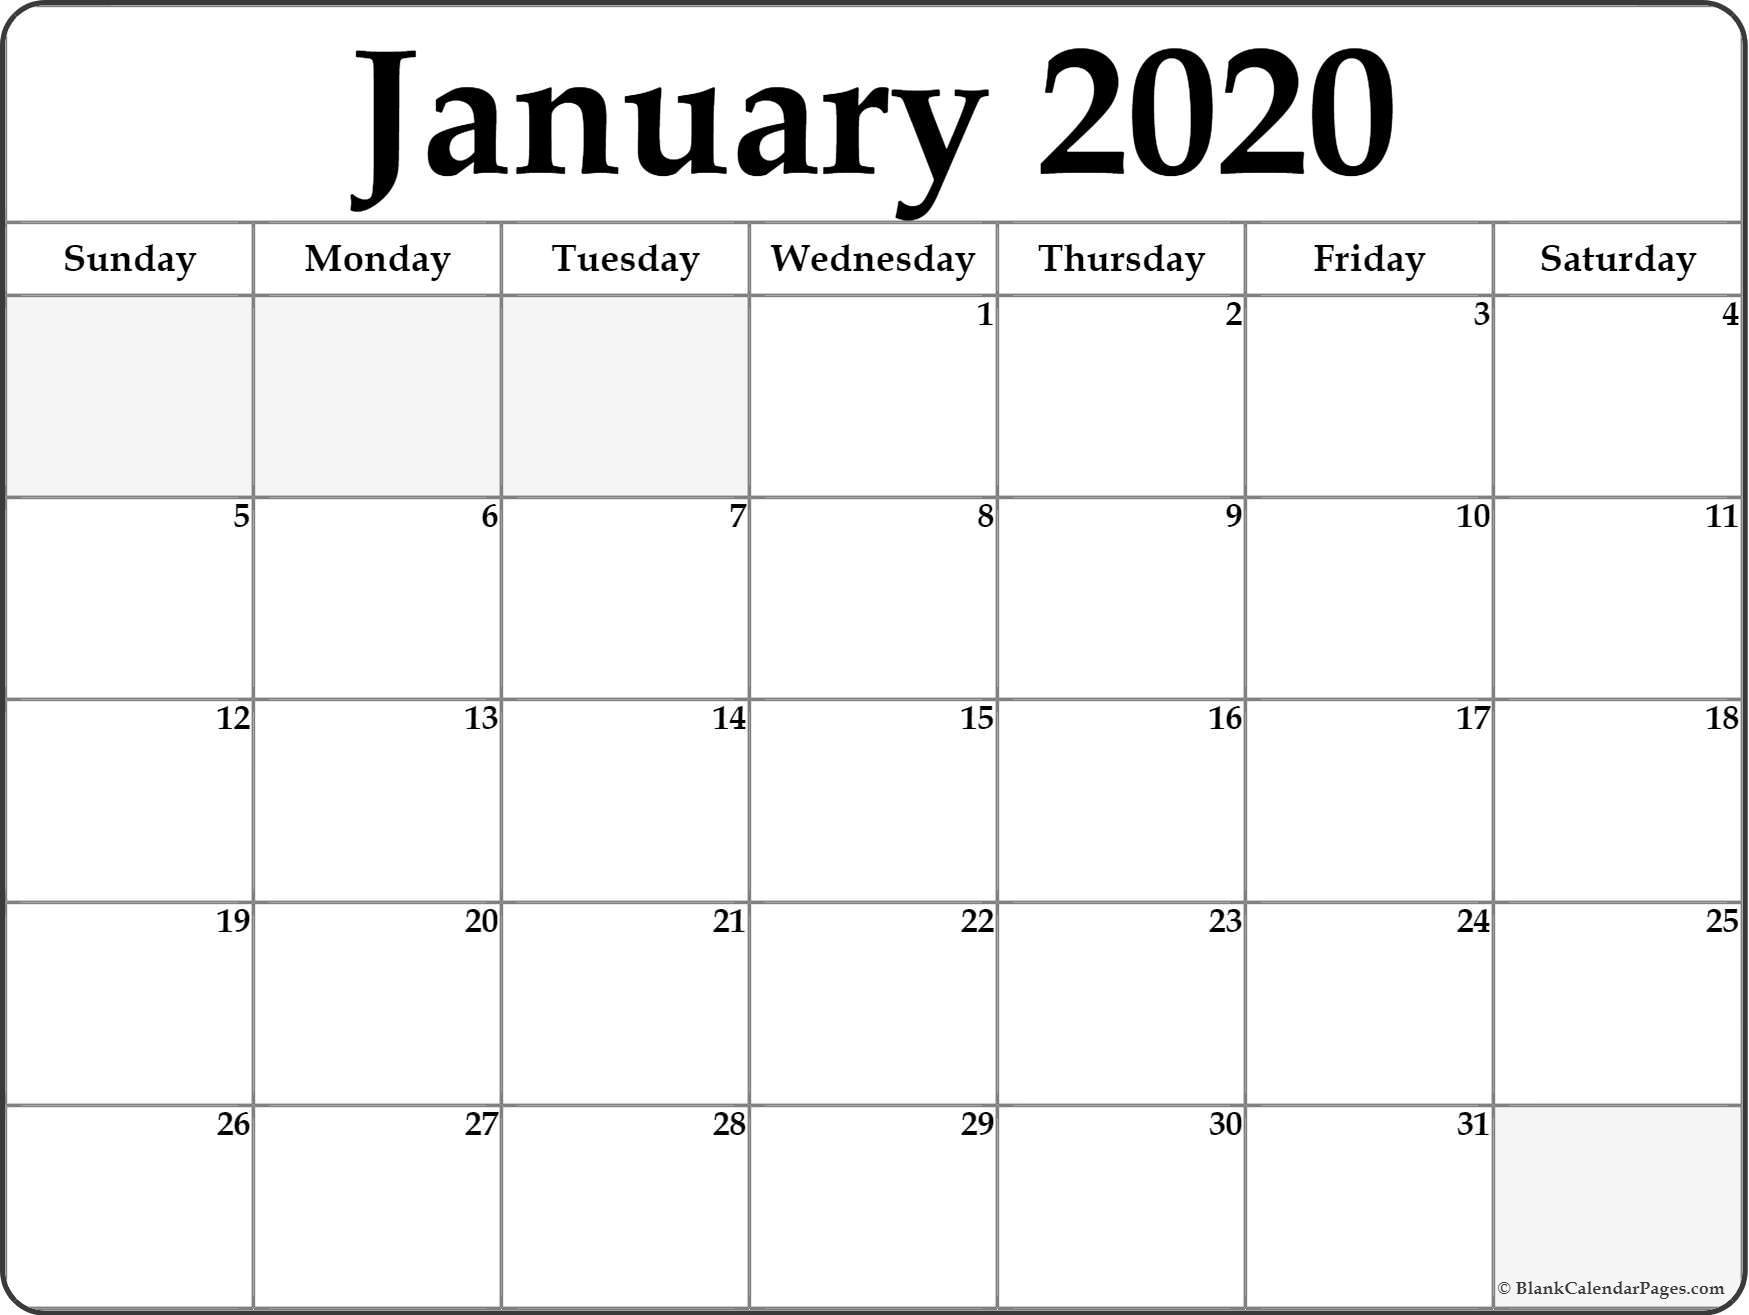 Free Printable January 2020 Calendar January 2020 Blank Calendar Collection